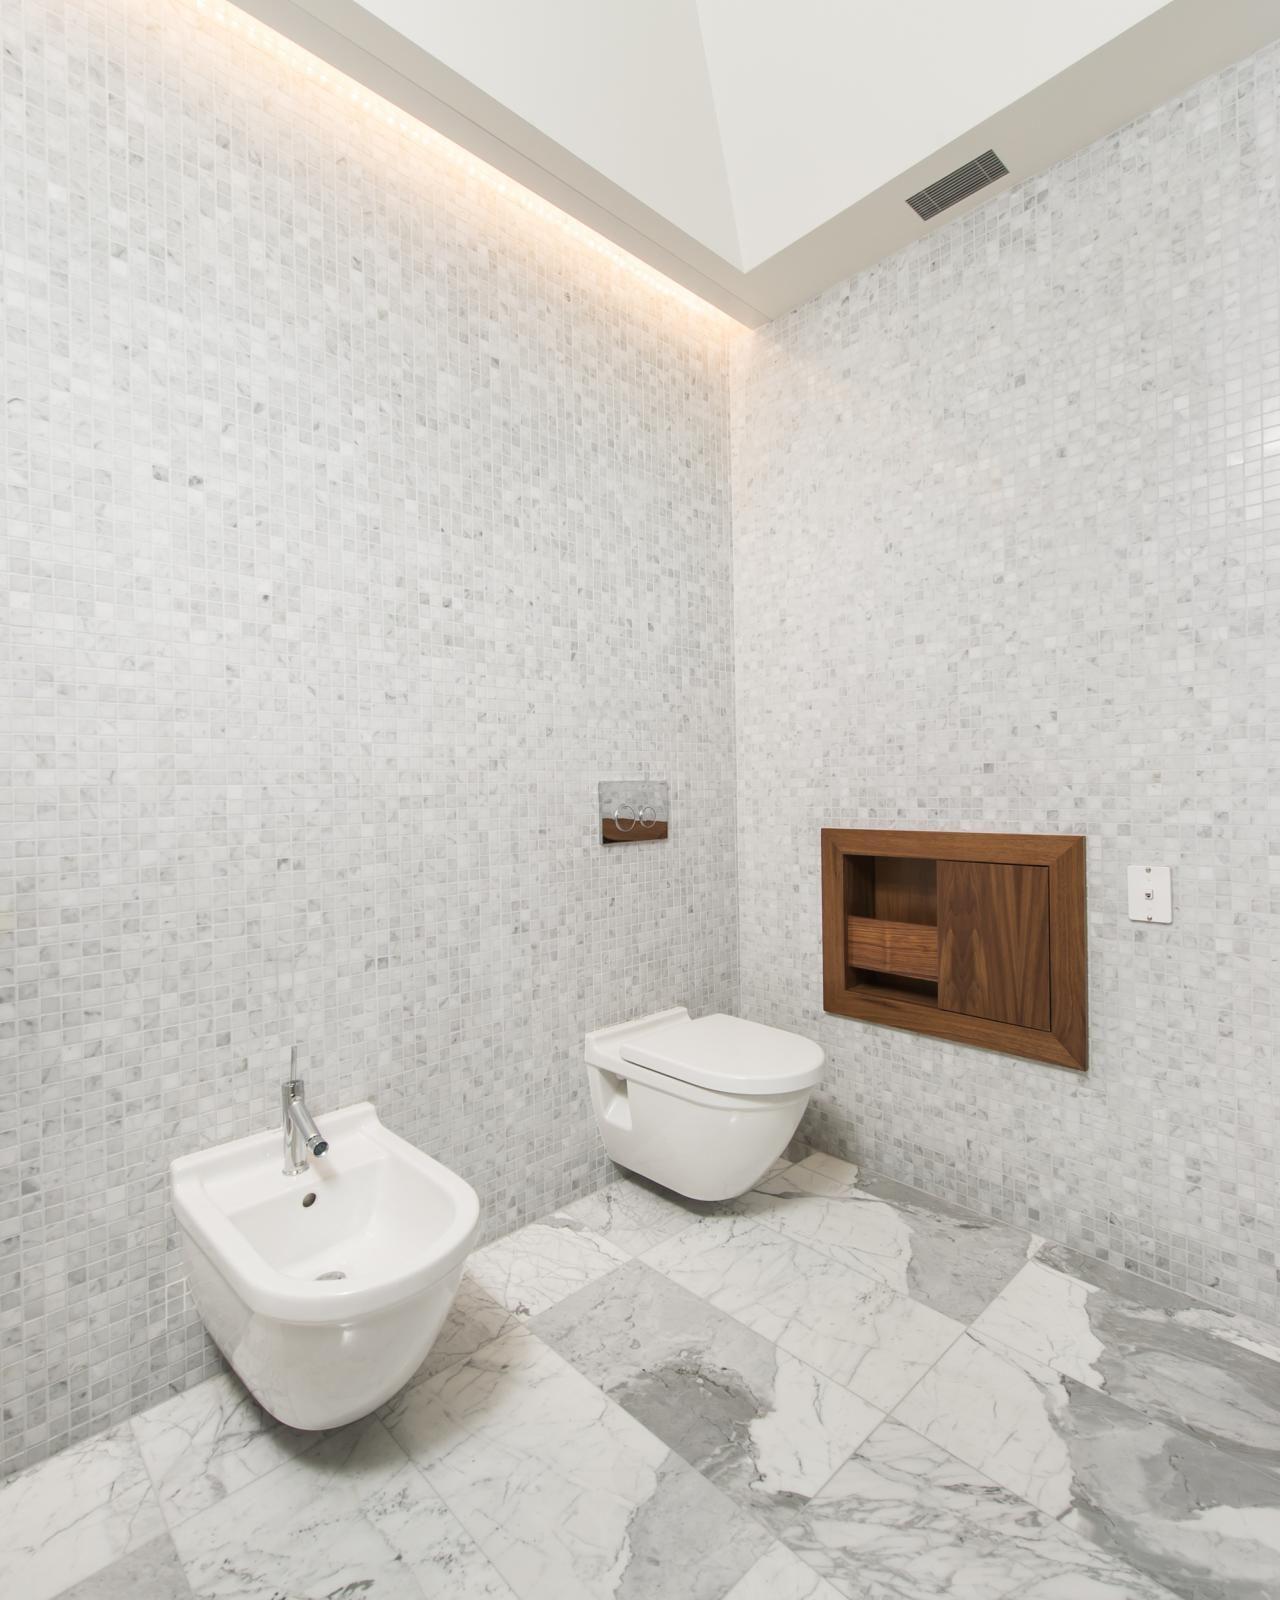 Master Retreats | Fresh Faces of Design | HGTV | ECLECTIC HOME ...